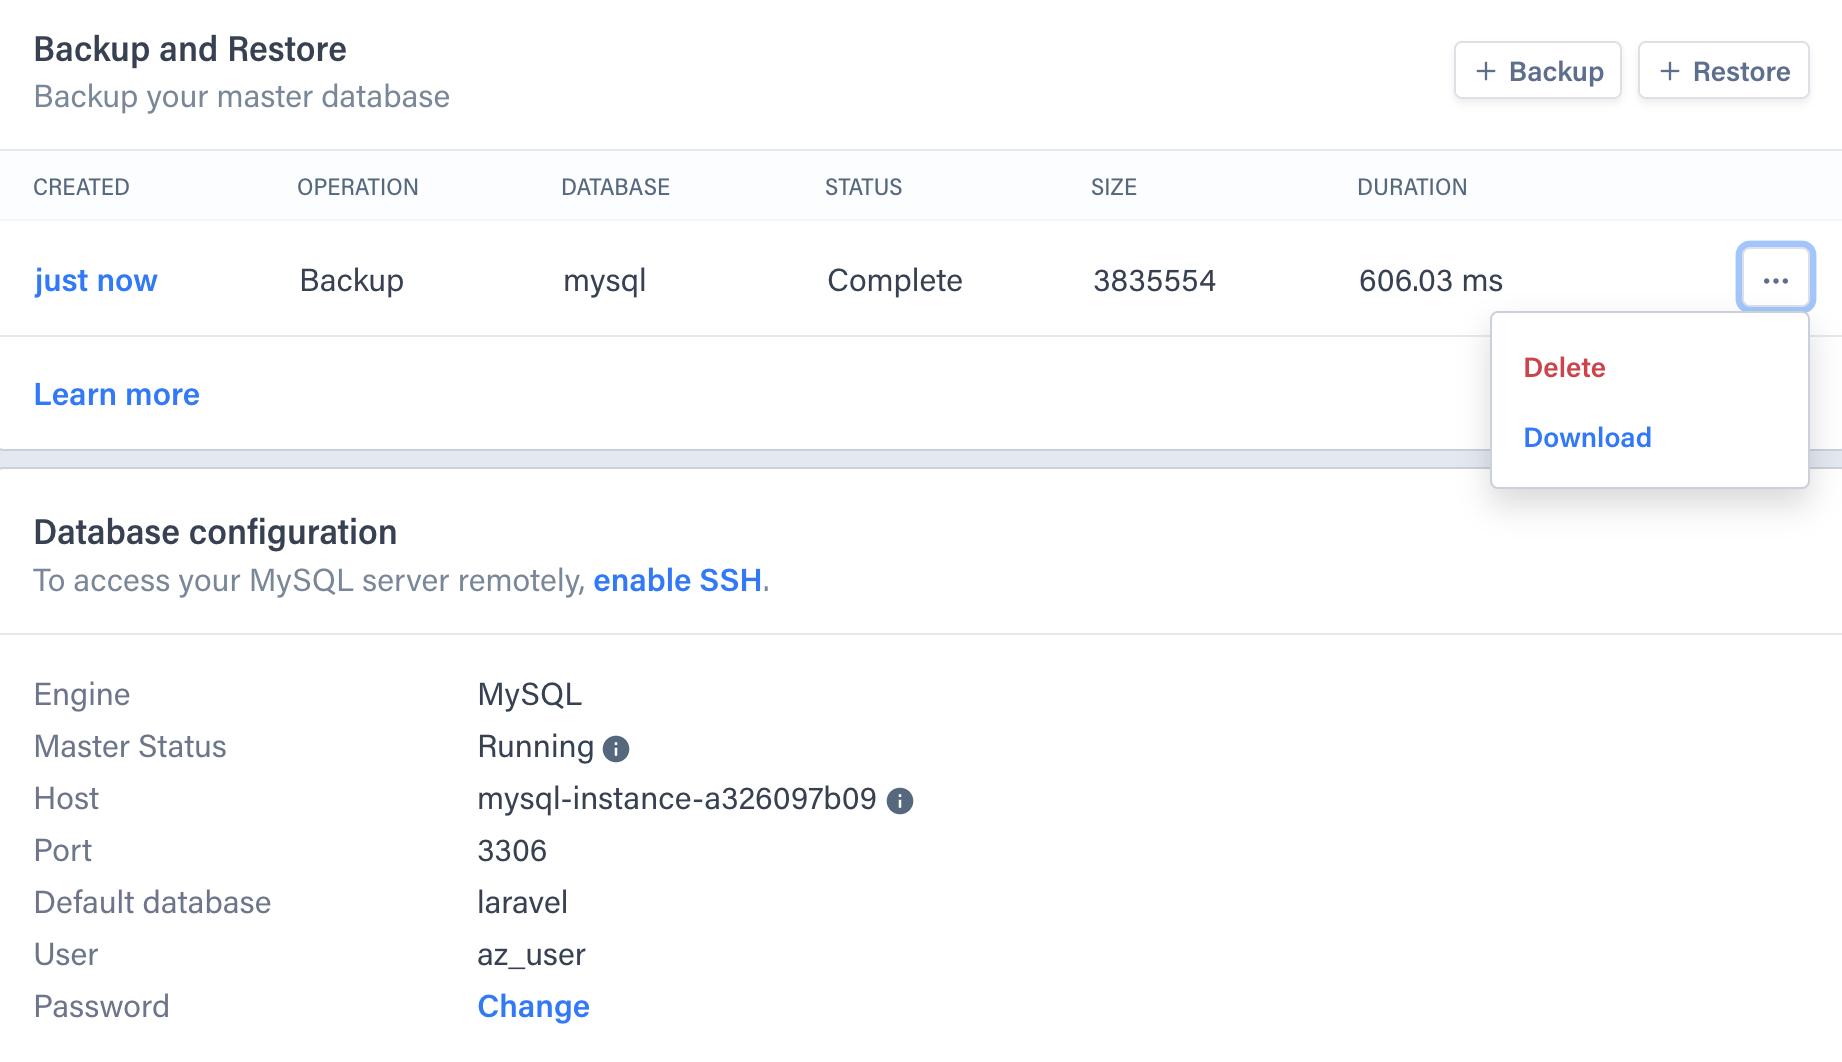 Backup/Restore Screenshot